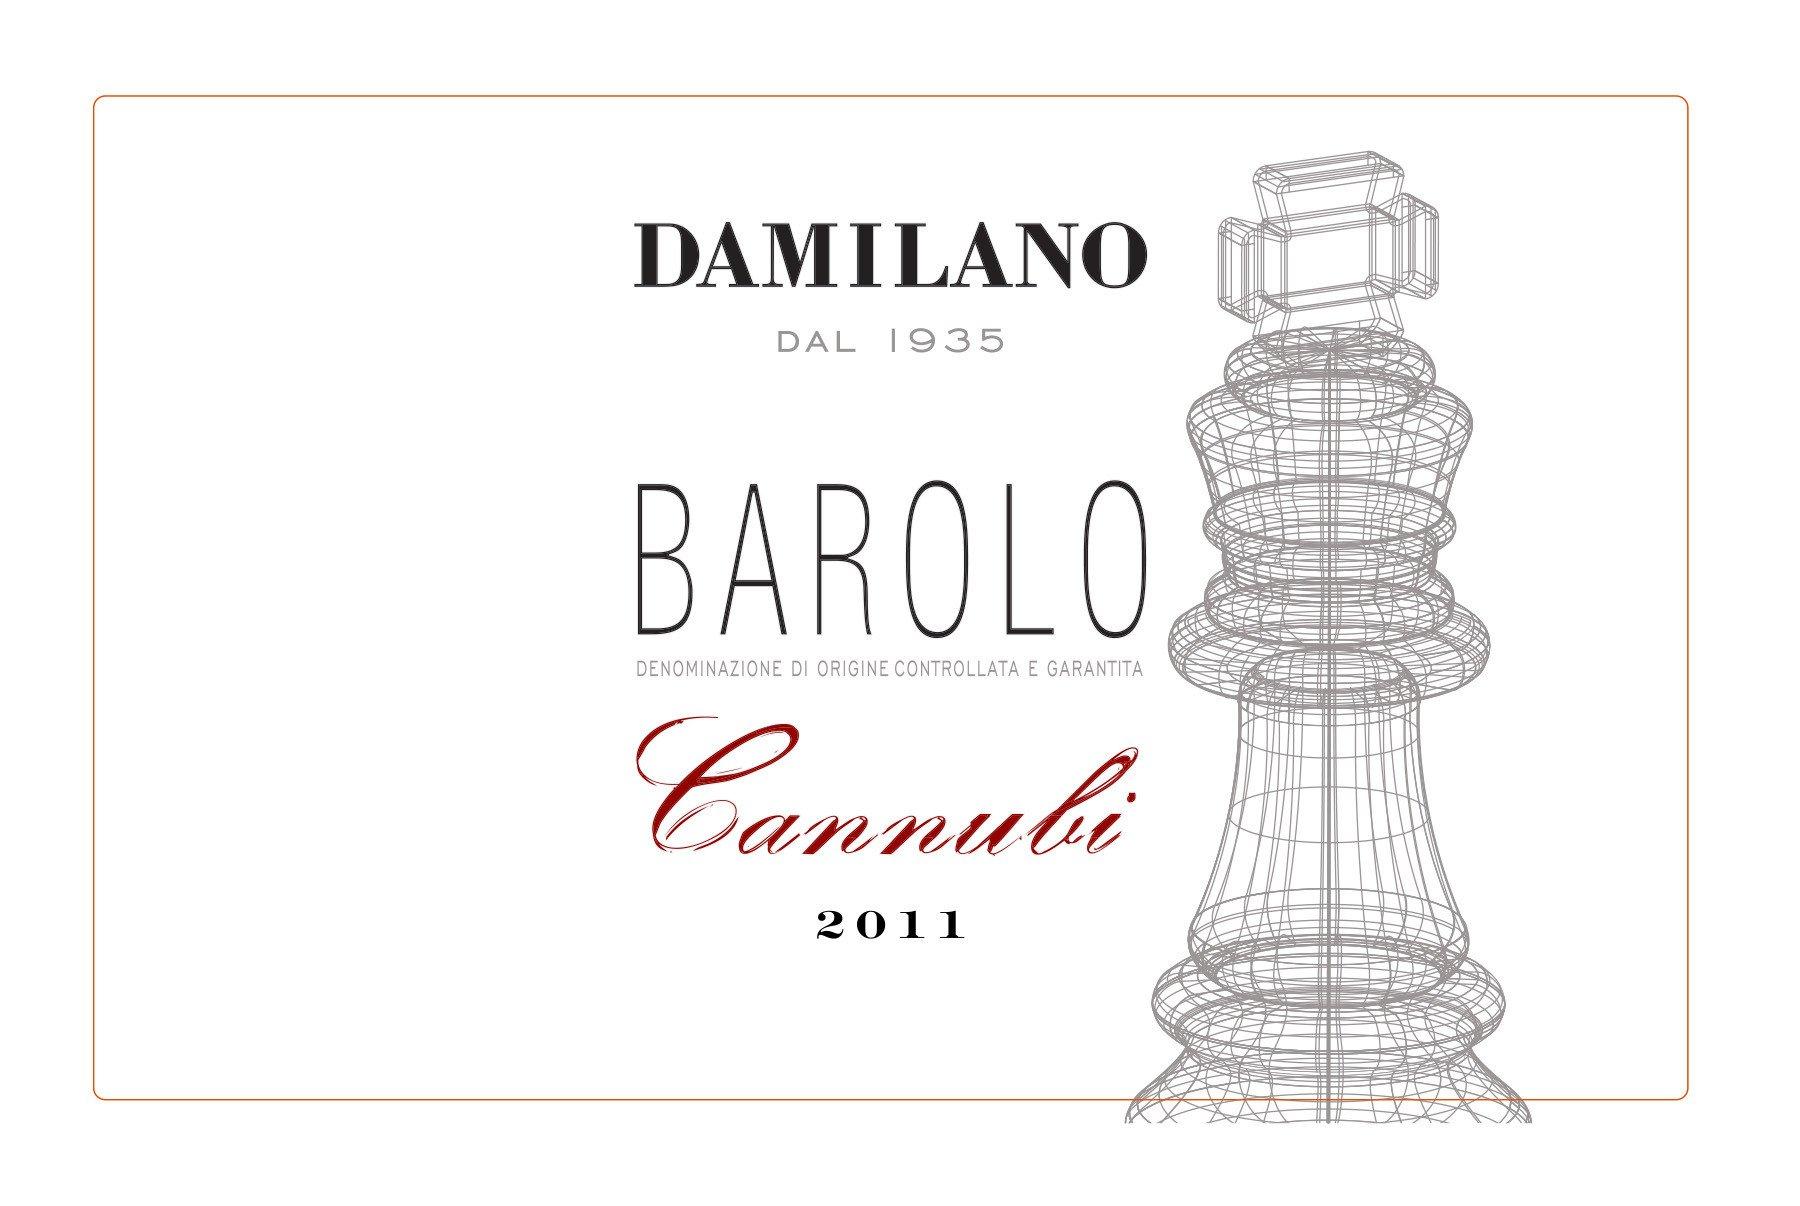 Damilano Barolo Cannubi Mathusalem 2009